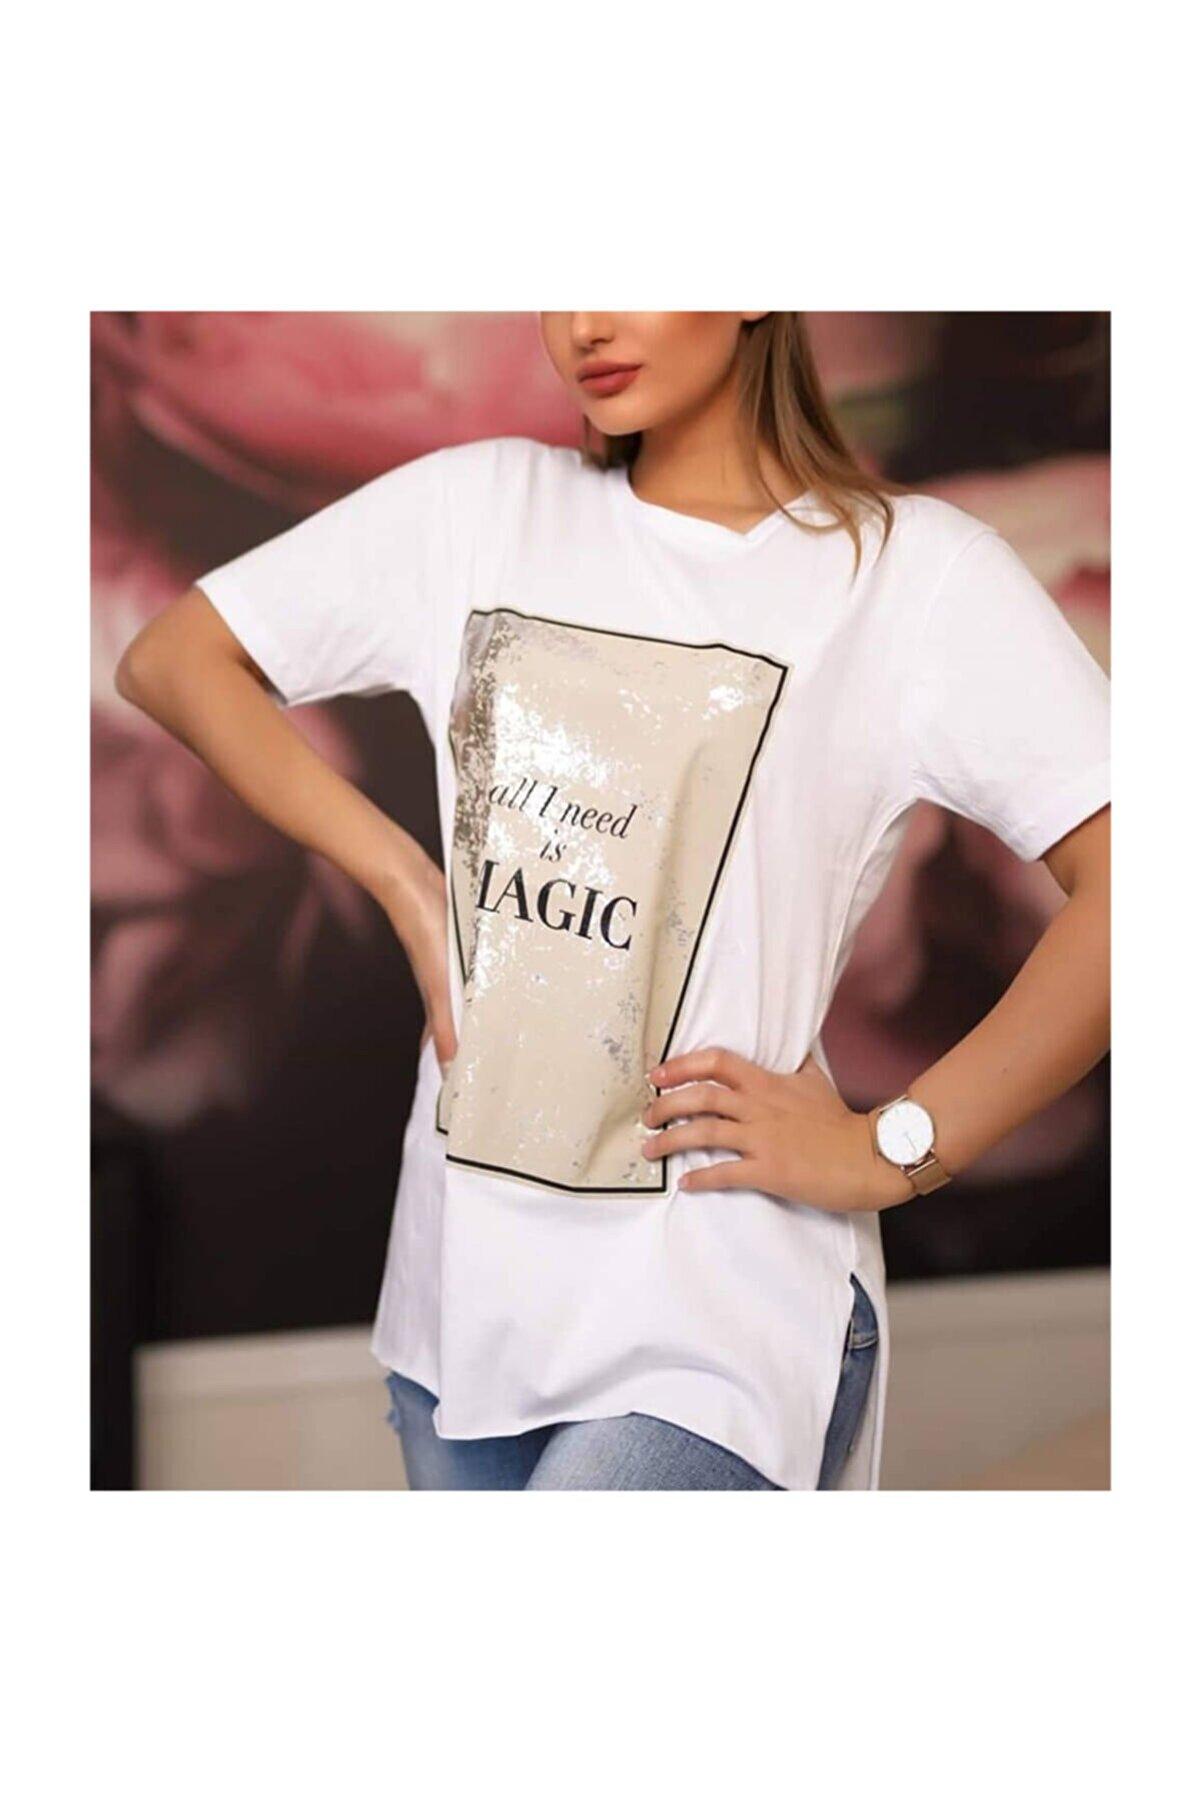 Suanye Beyaz Pano Varak Baskılı Tshirt